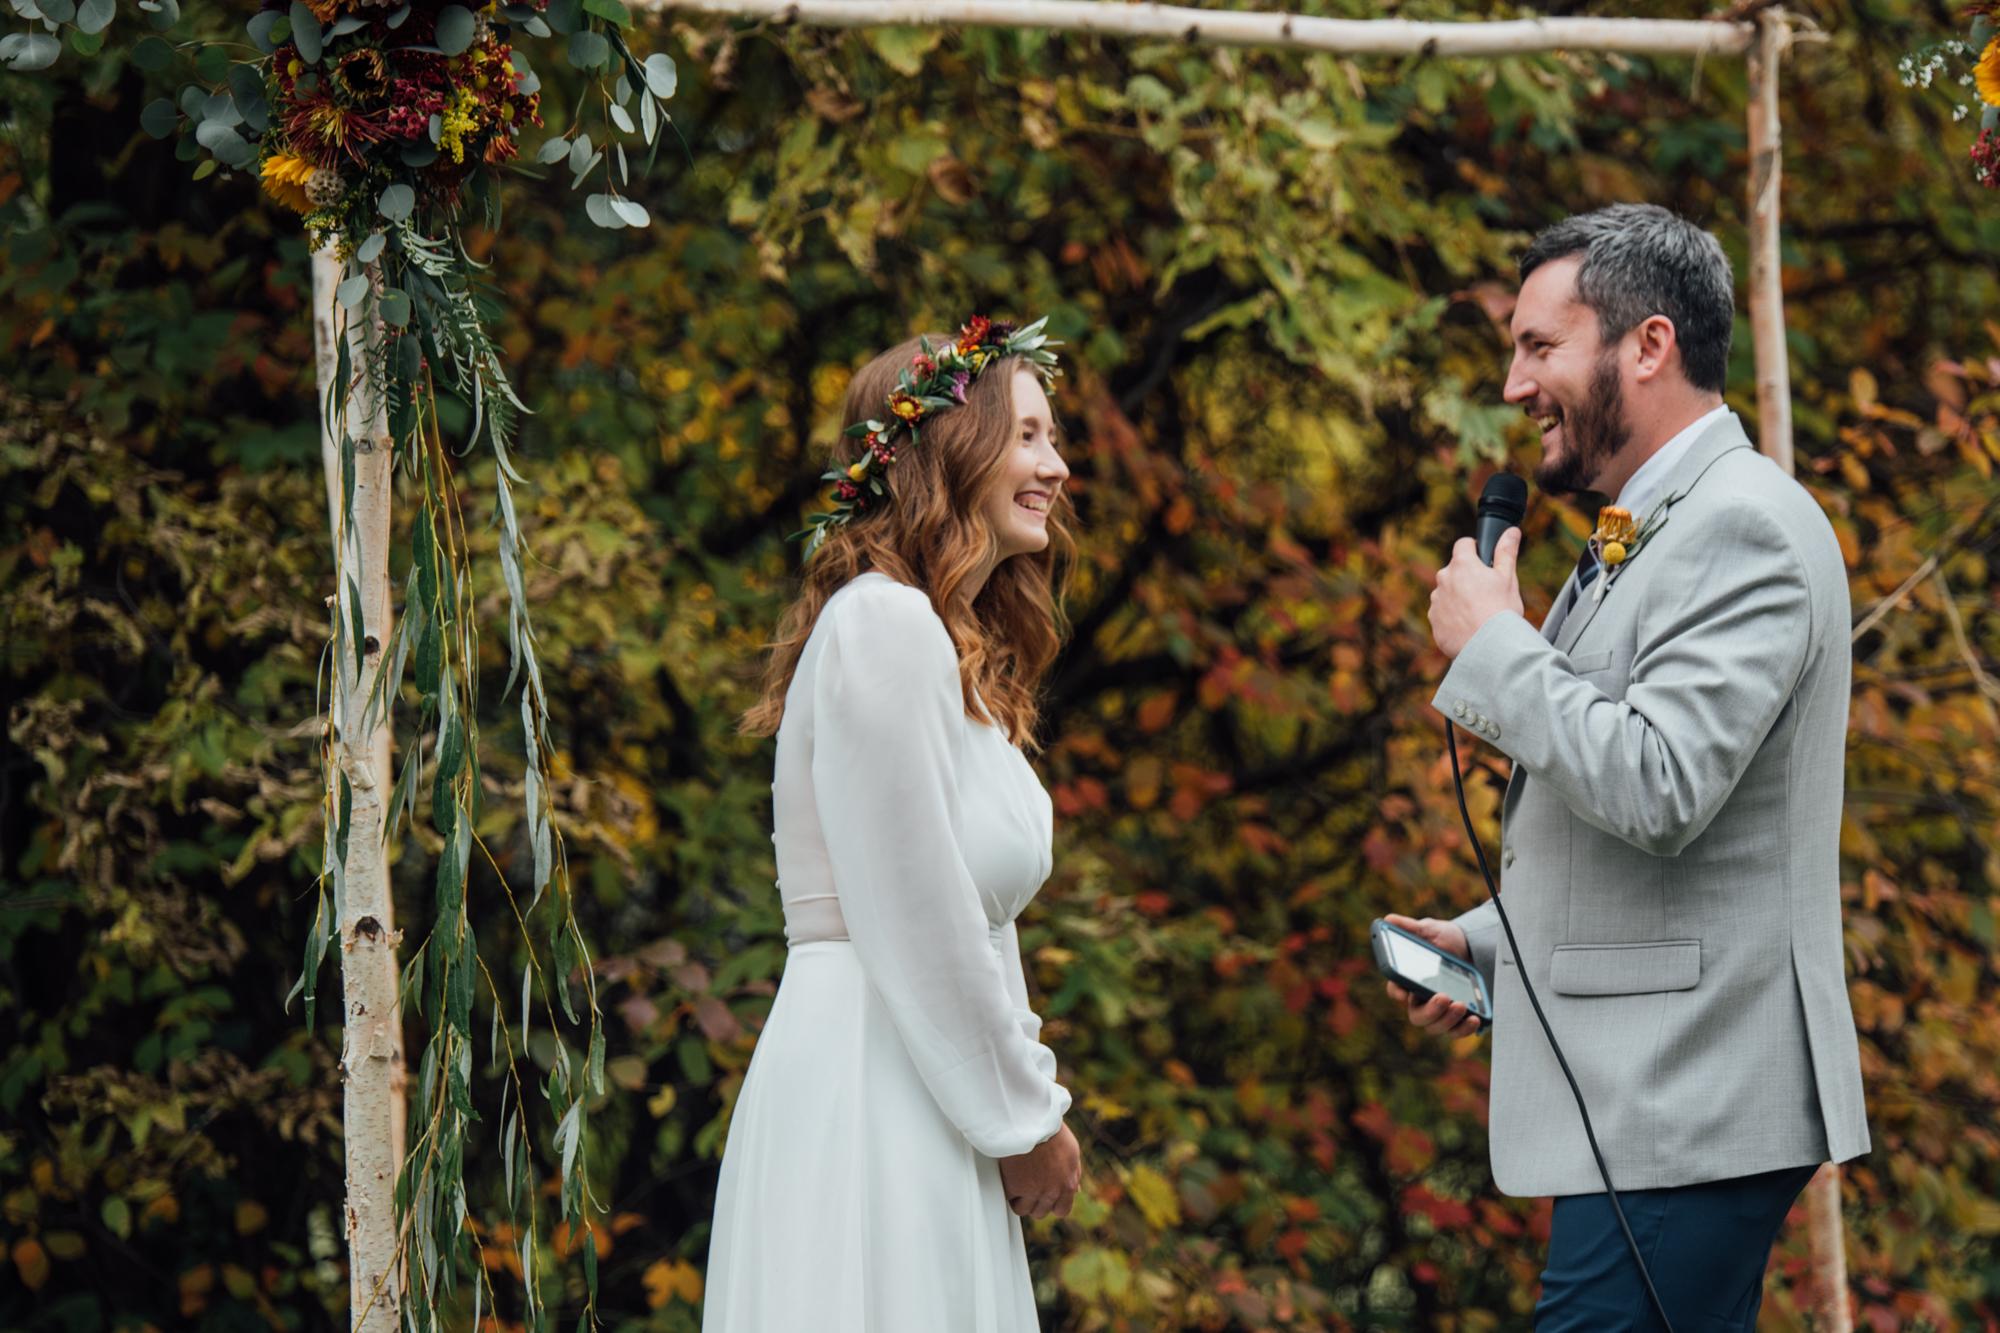 minneapolis-wedding-photographer-1-13.jpg